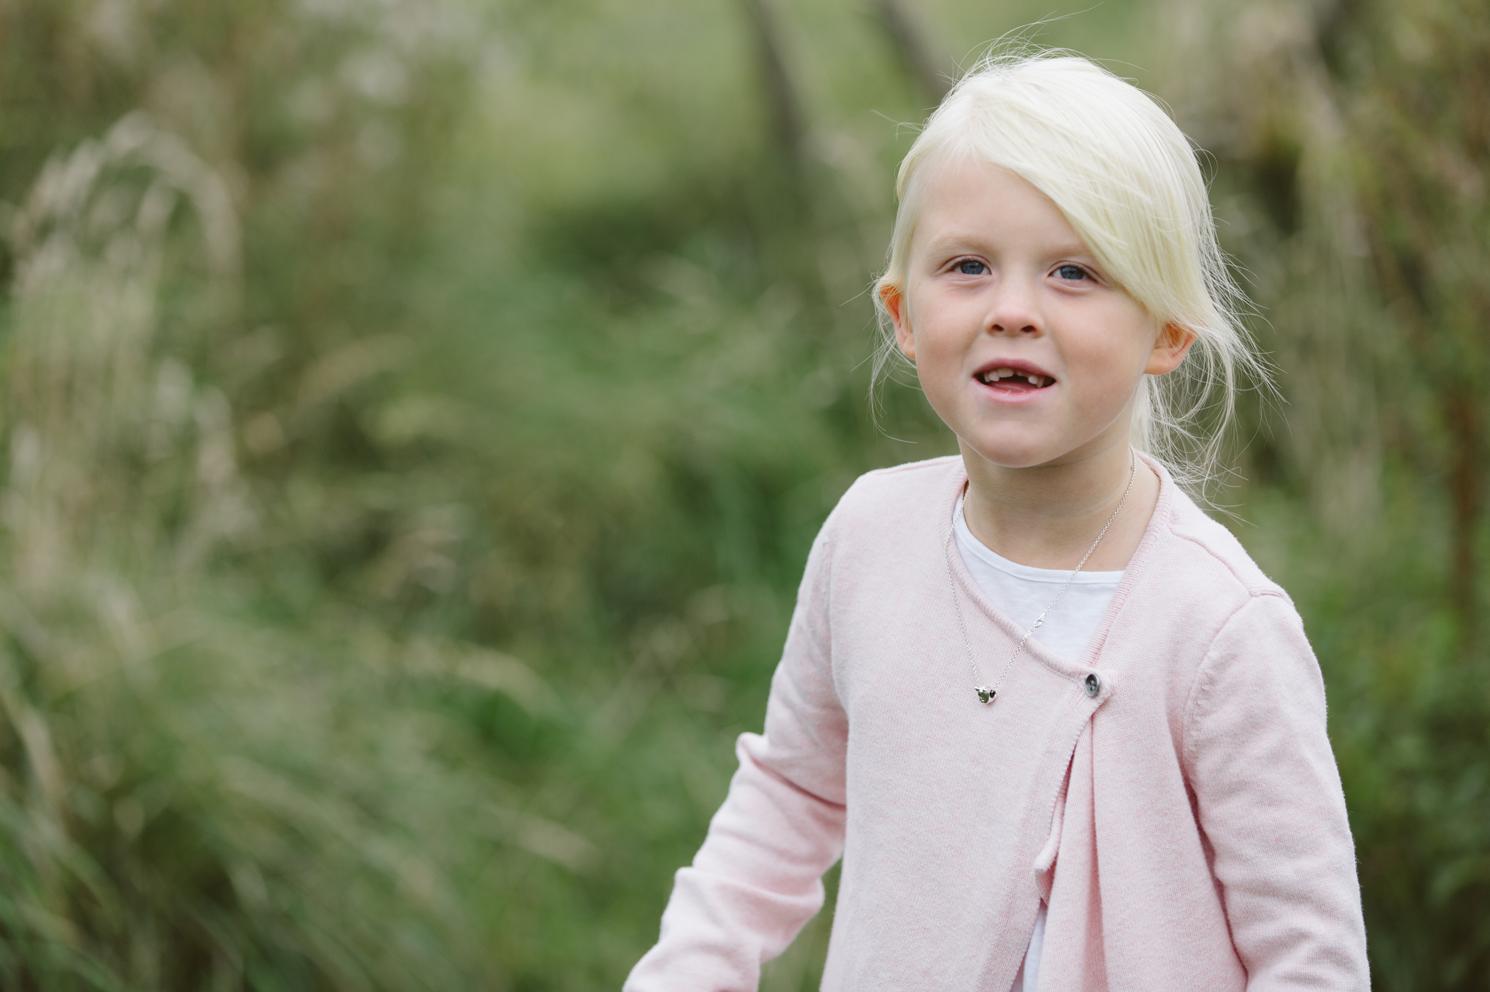 familjefotografering-syskonkarlek-barn-syskonfotografering-lillebror-storasyster-maria-o-photo-klagerup-5